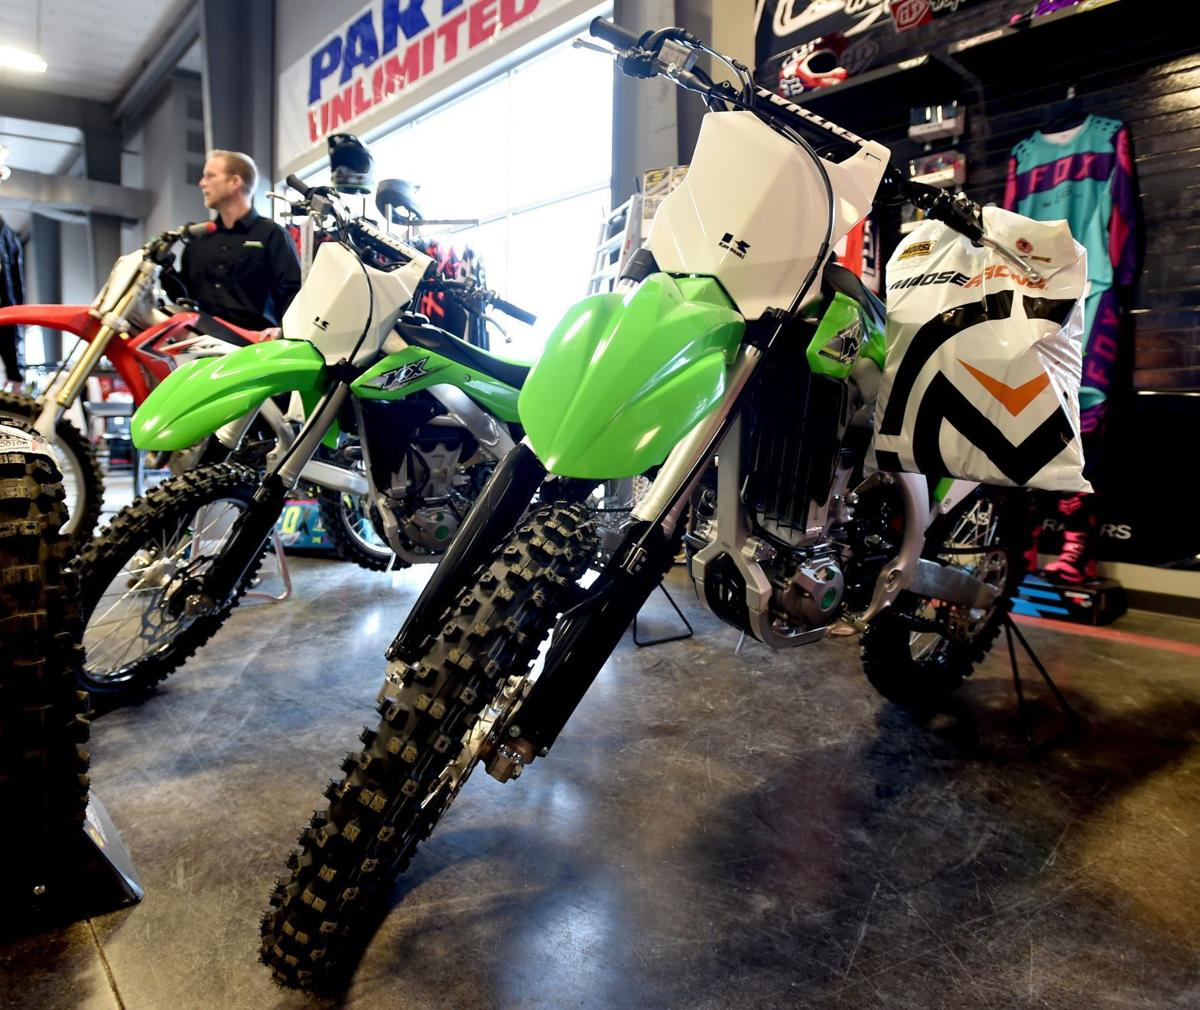 Kawasaki dirtbikes